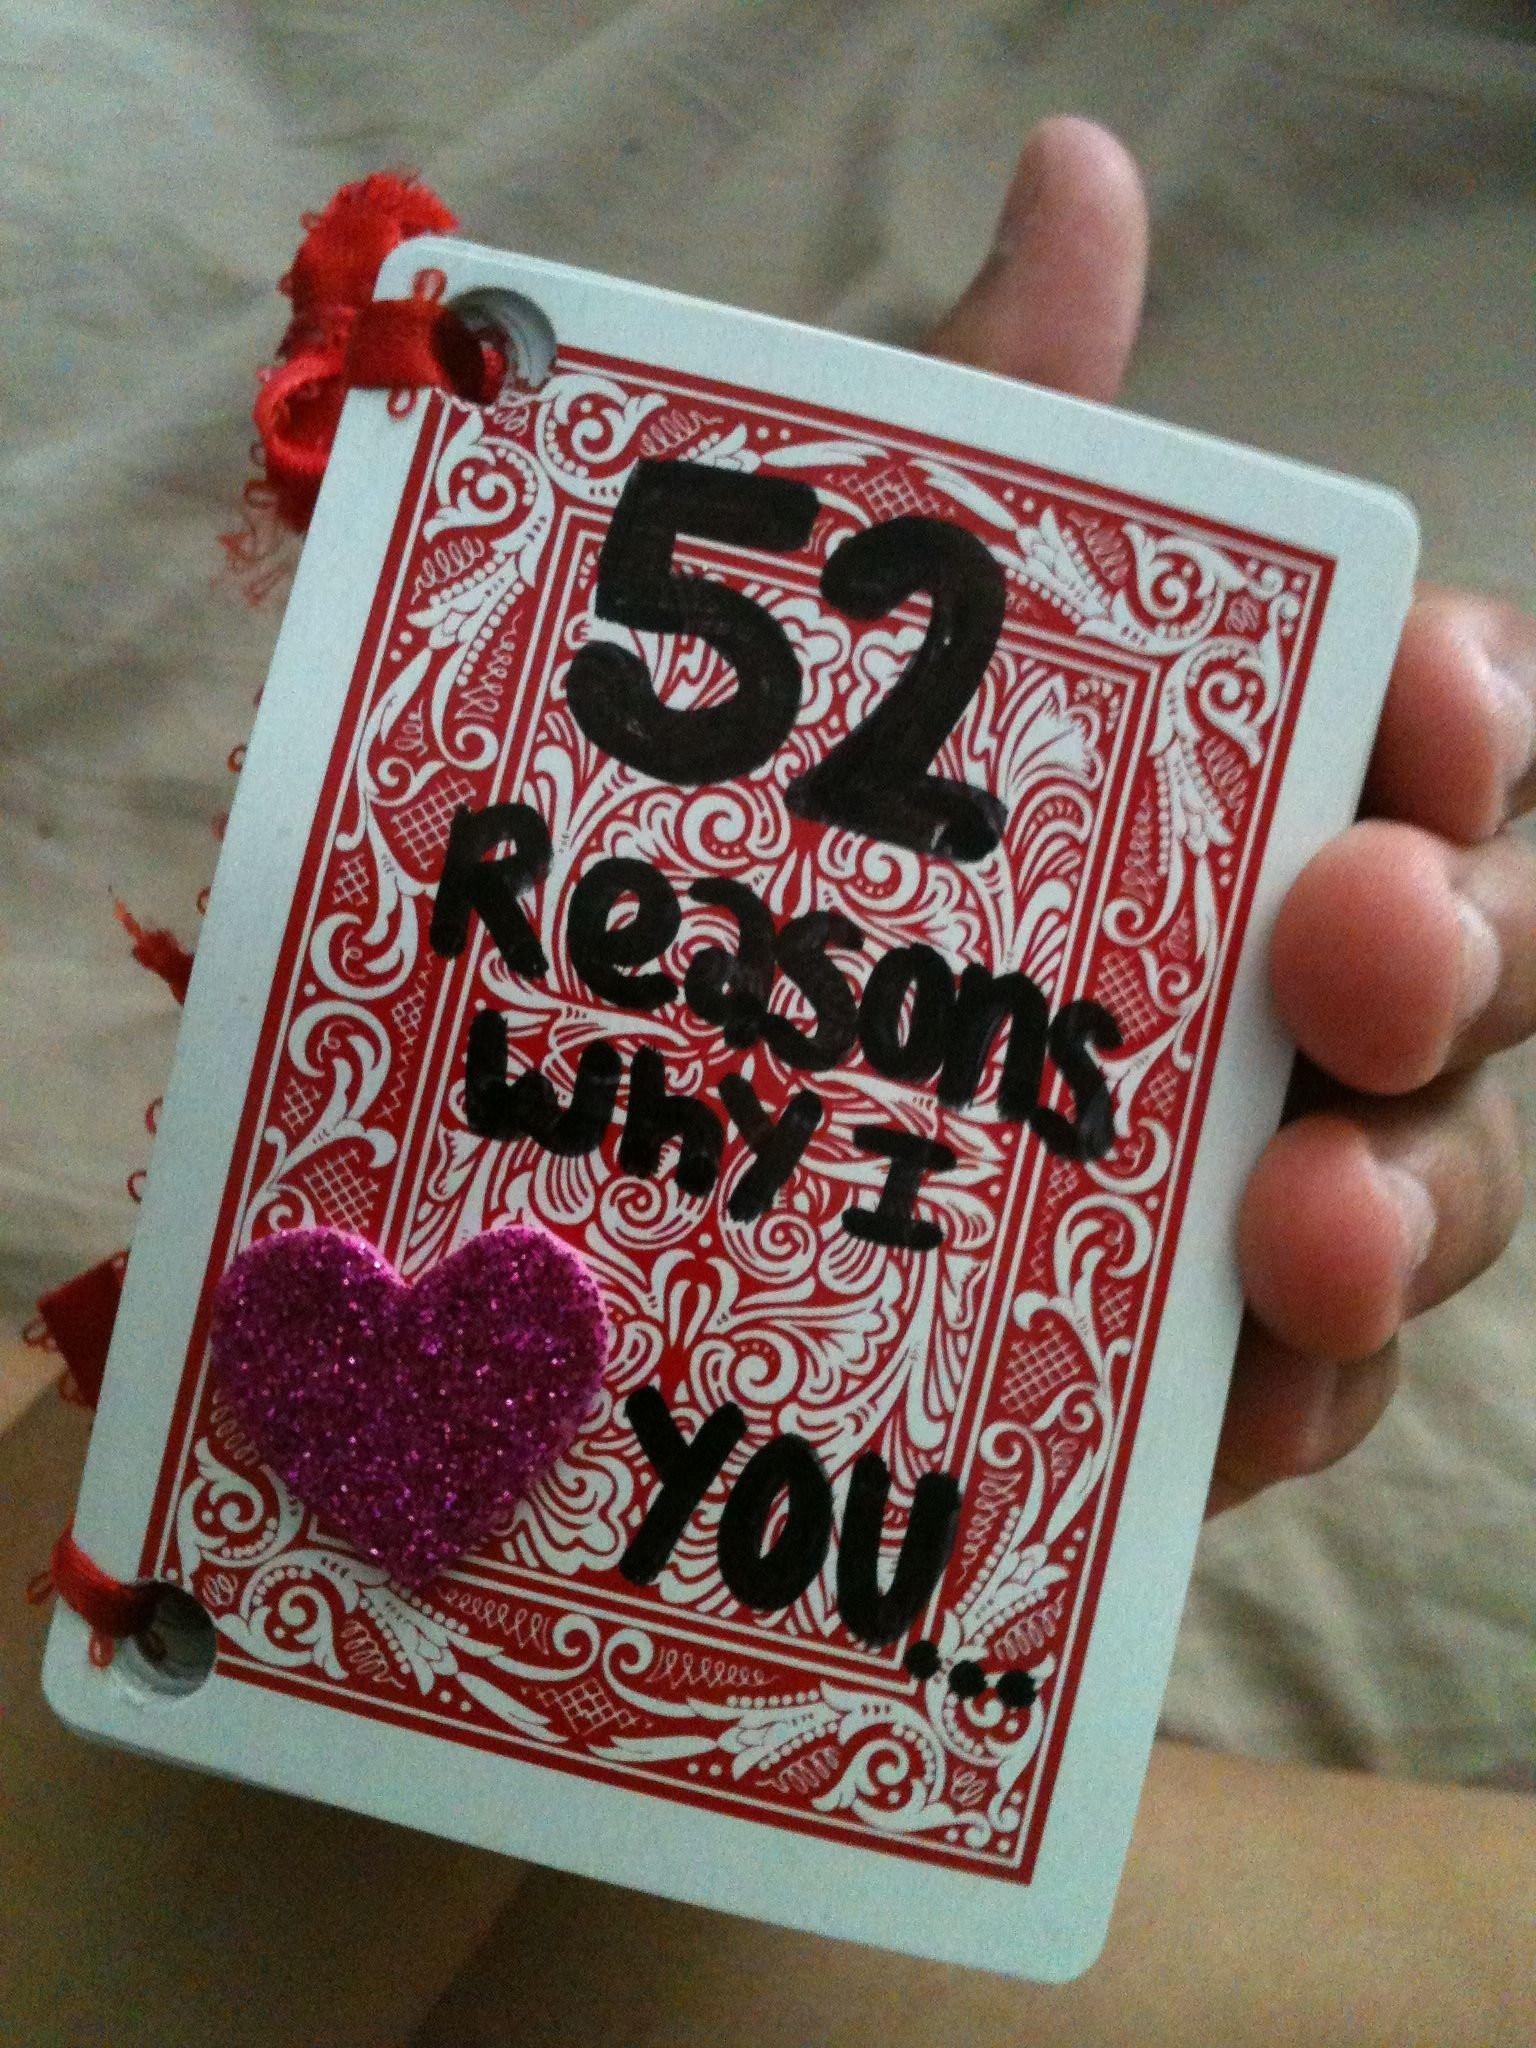 Cool Gift Ideas For Boyfriend  10 Lovable Romantic Birthday Gift Ideas Boyfriend 2020